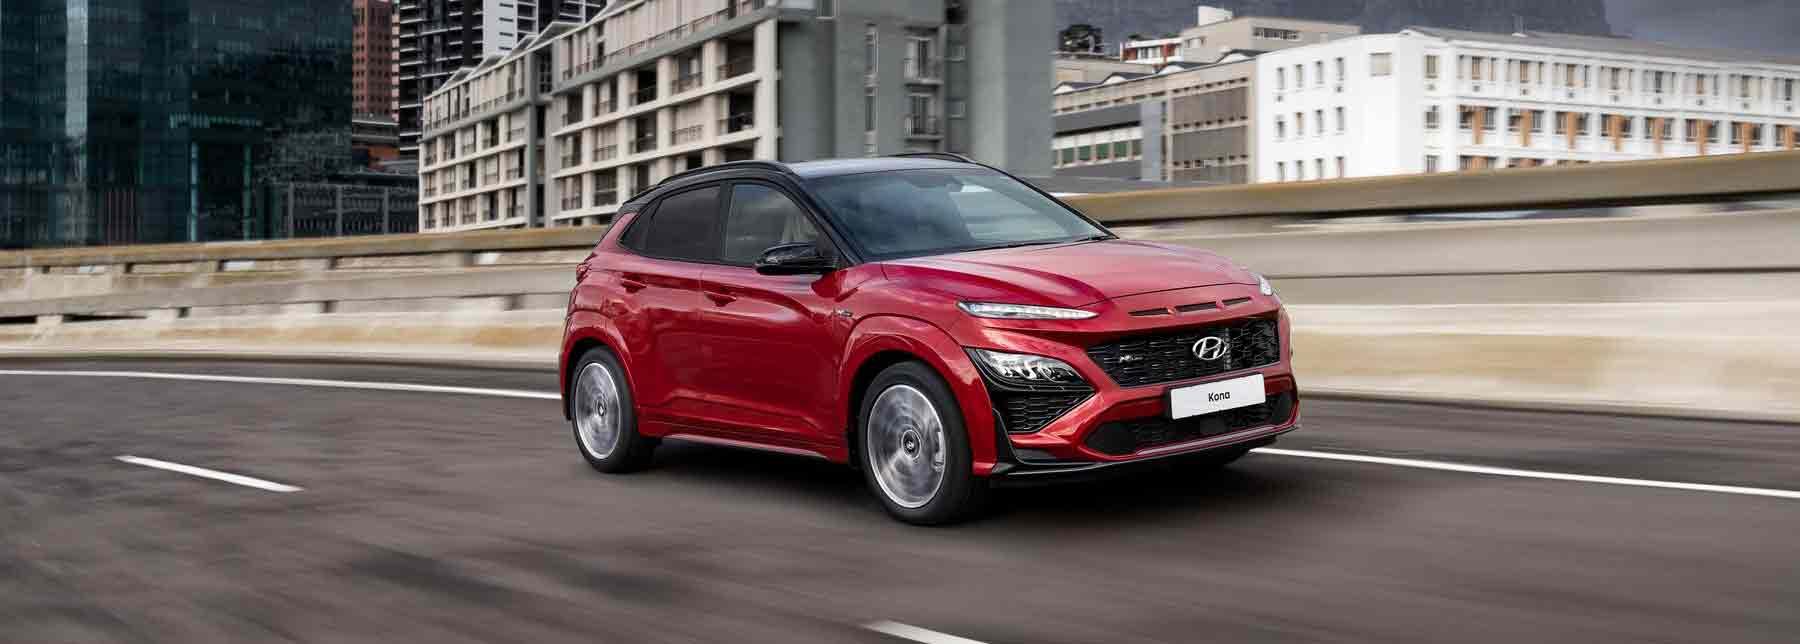 Hyundai expands Kona range to include N Line